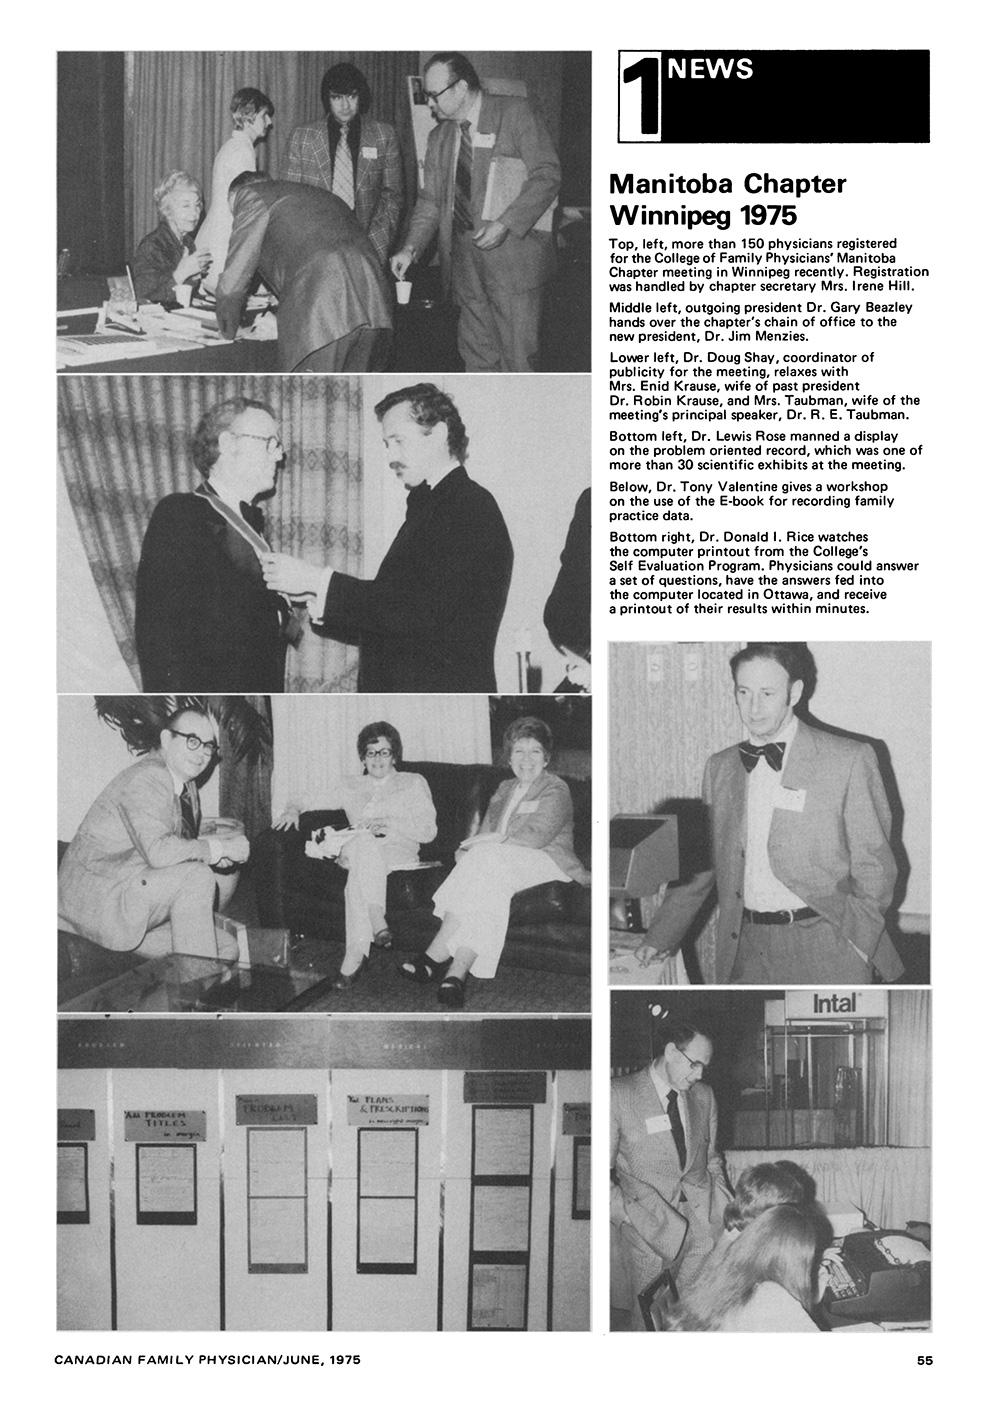 Manitoba Chapter meeting, 1975